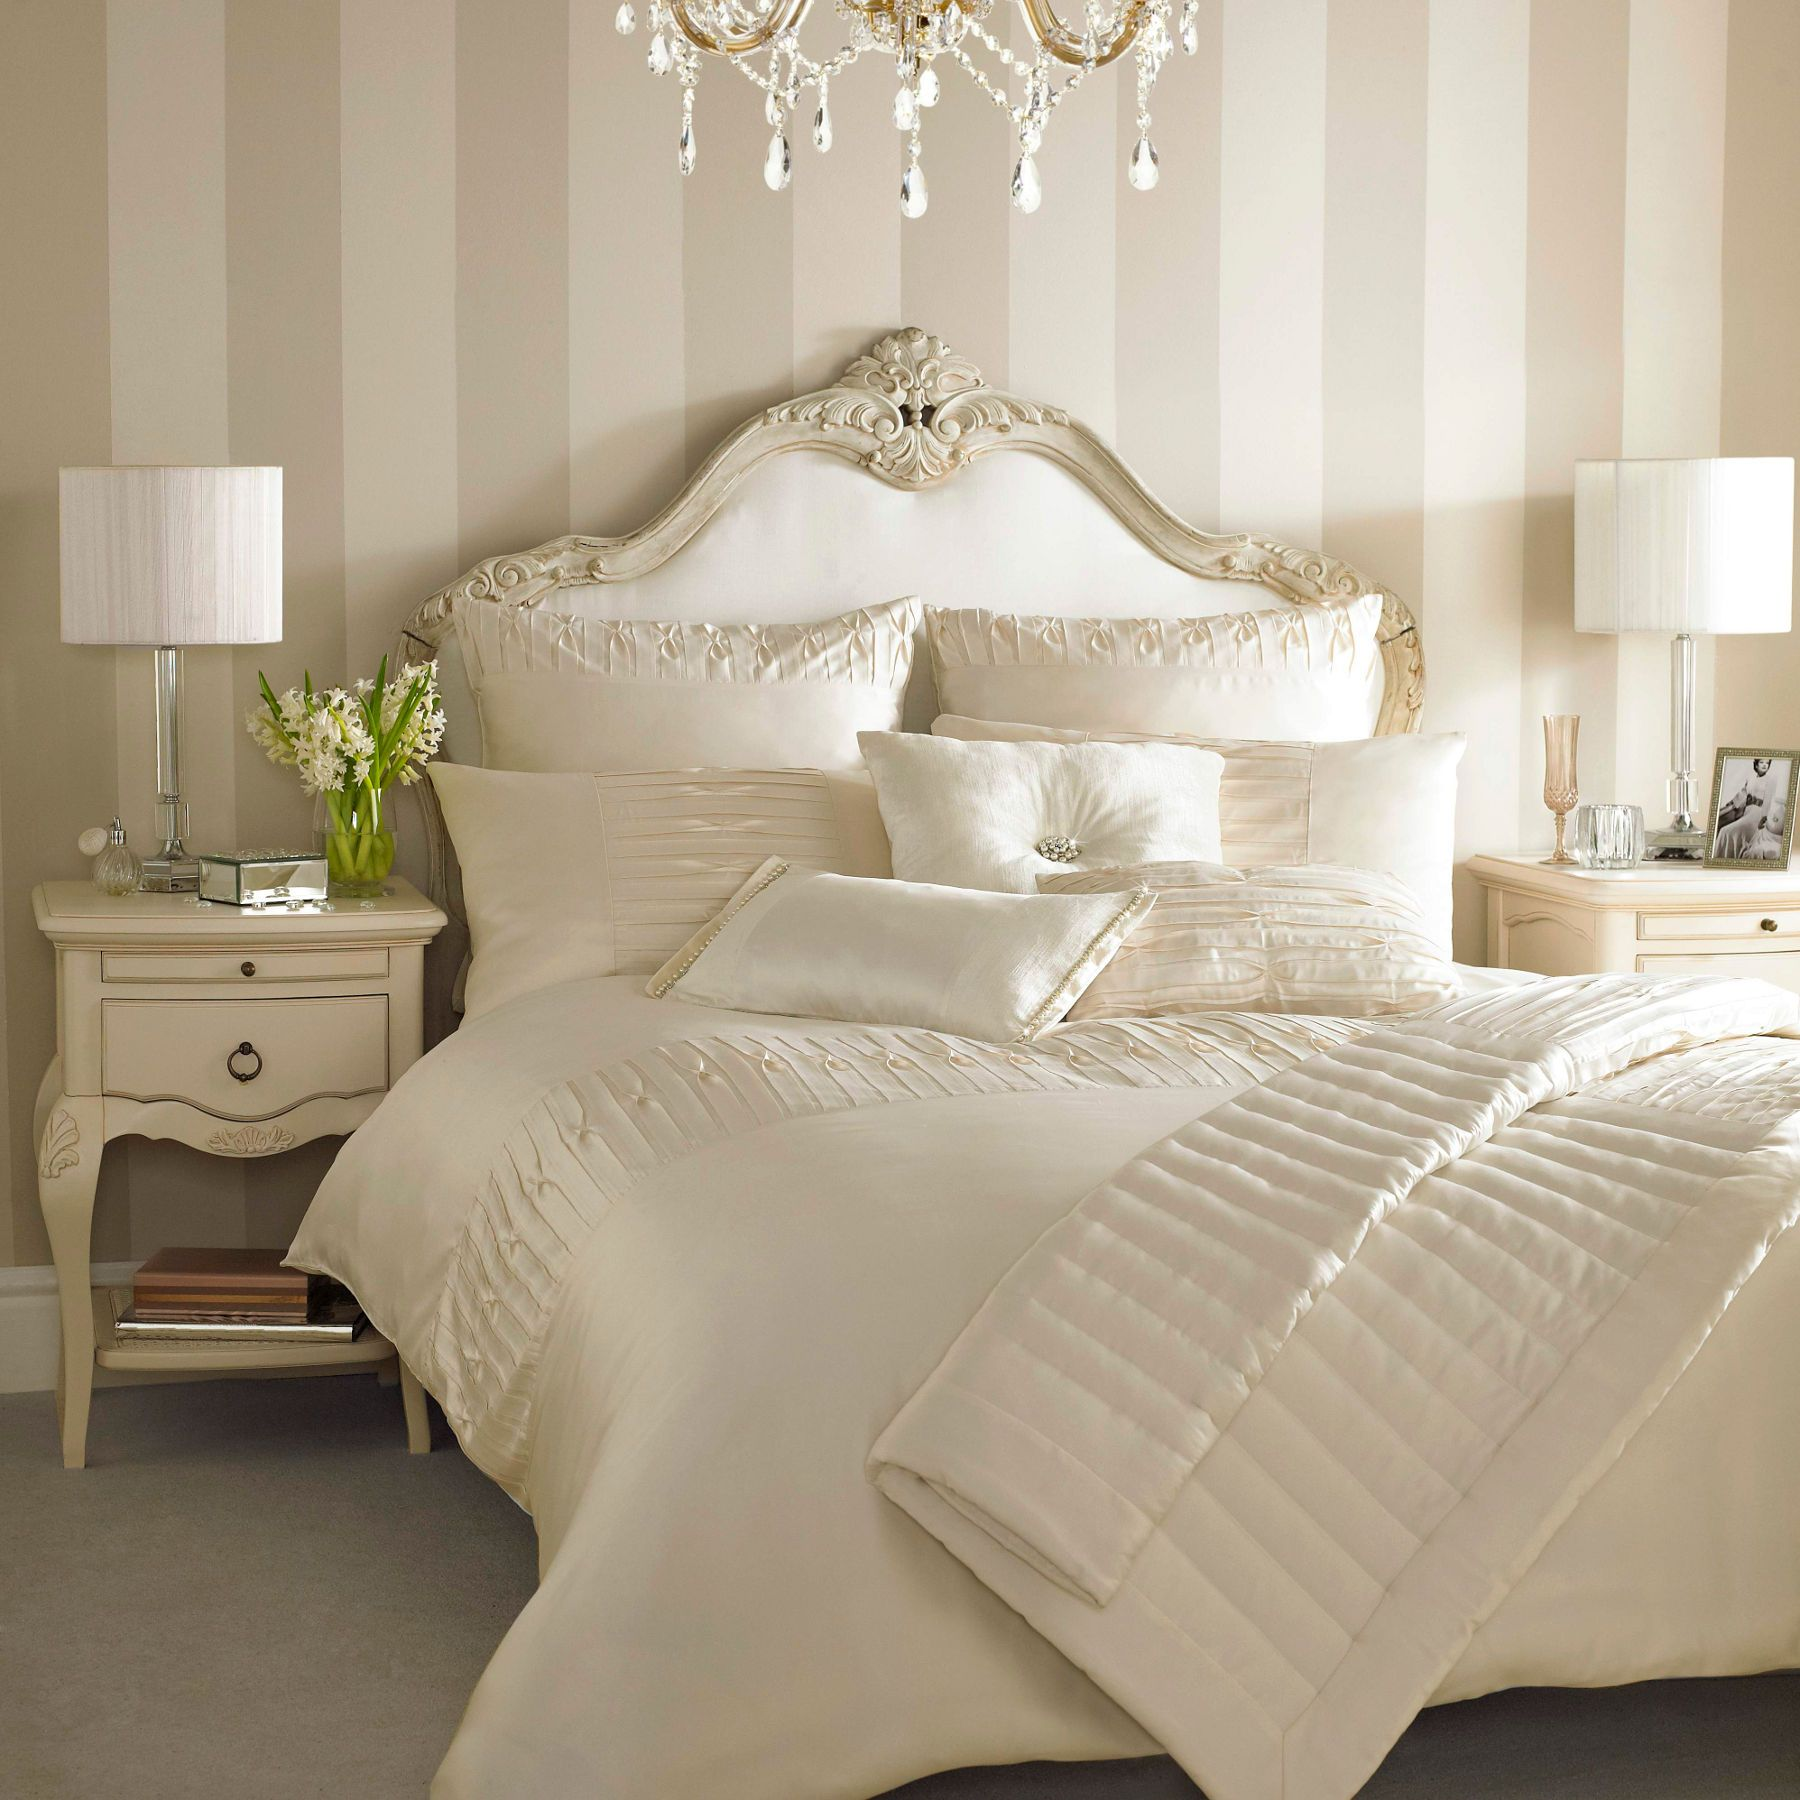 Ivory and cream bedroom Ivory and cream